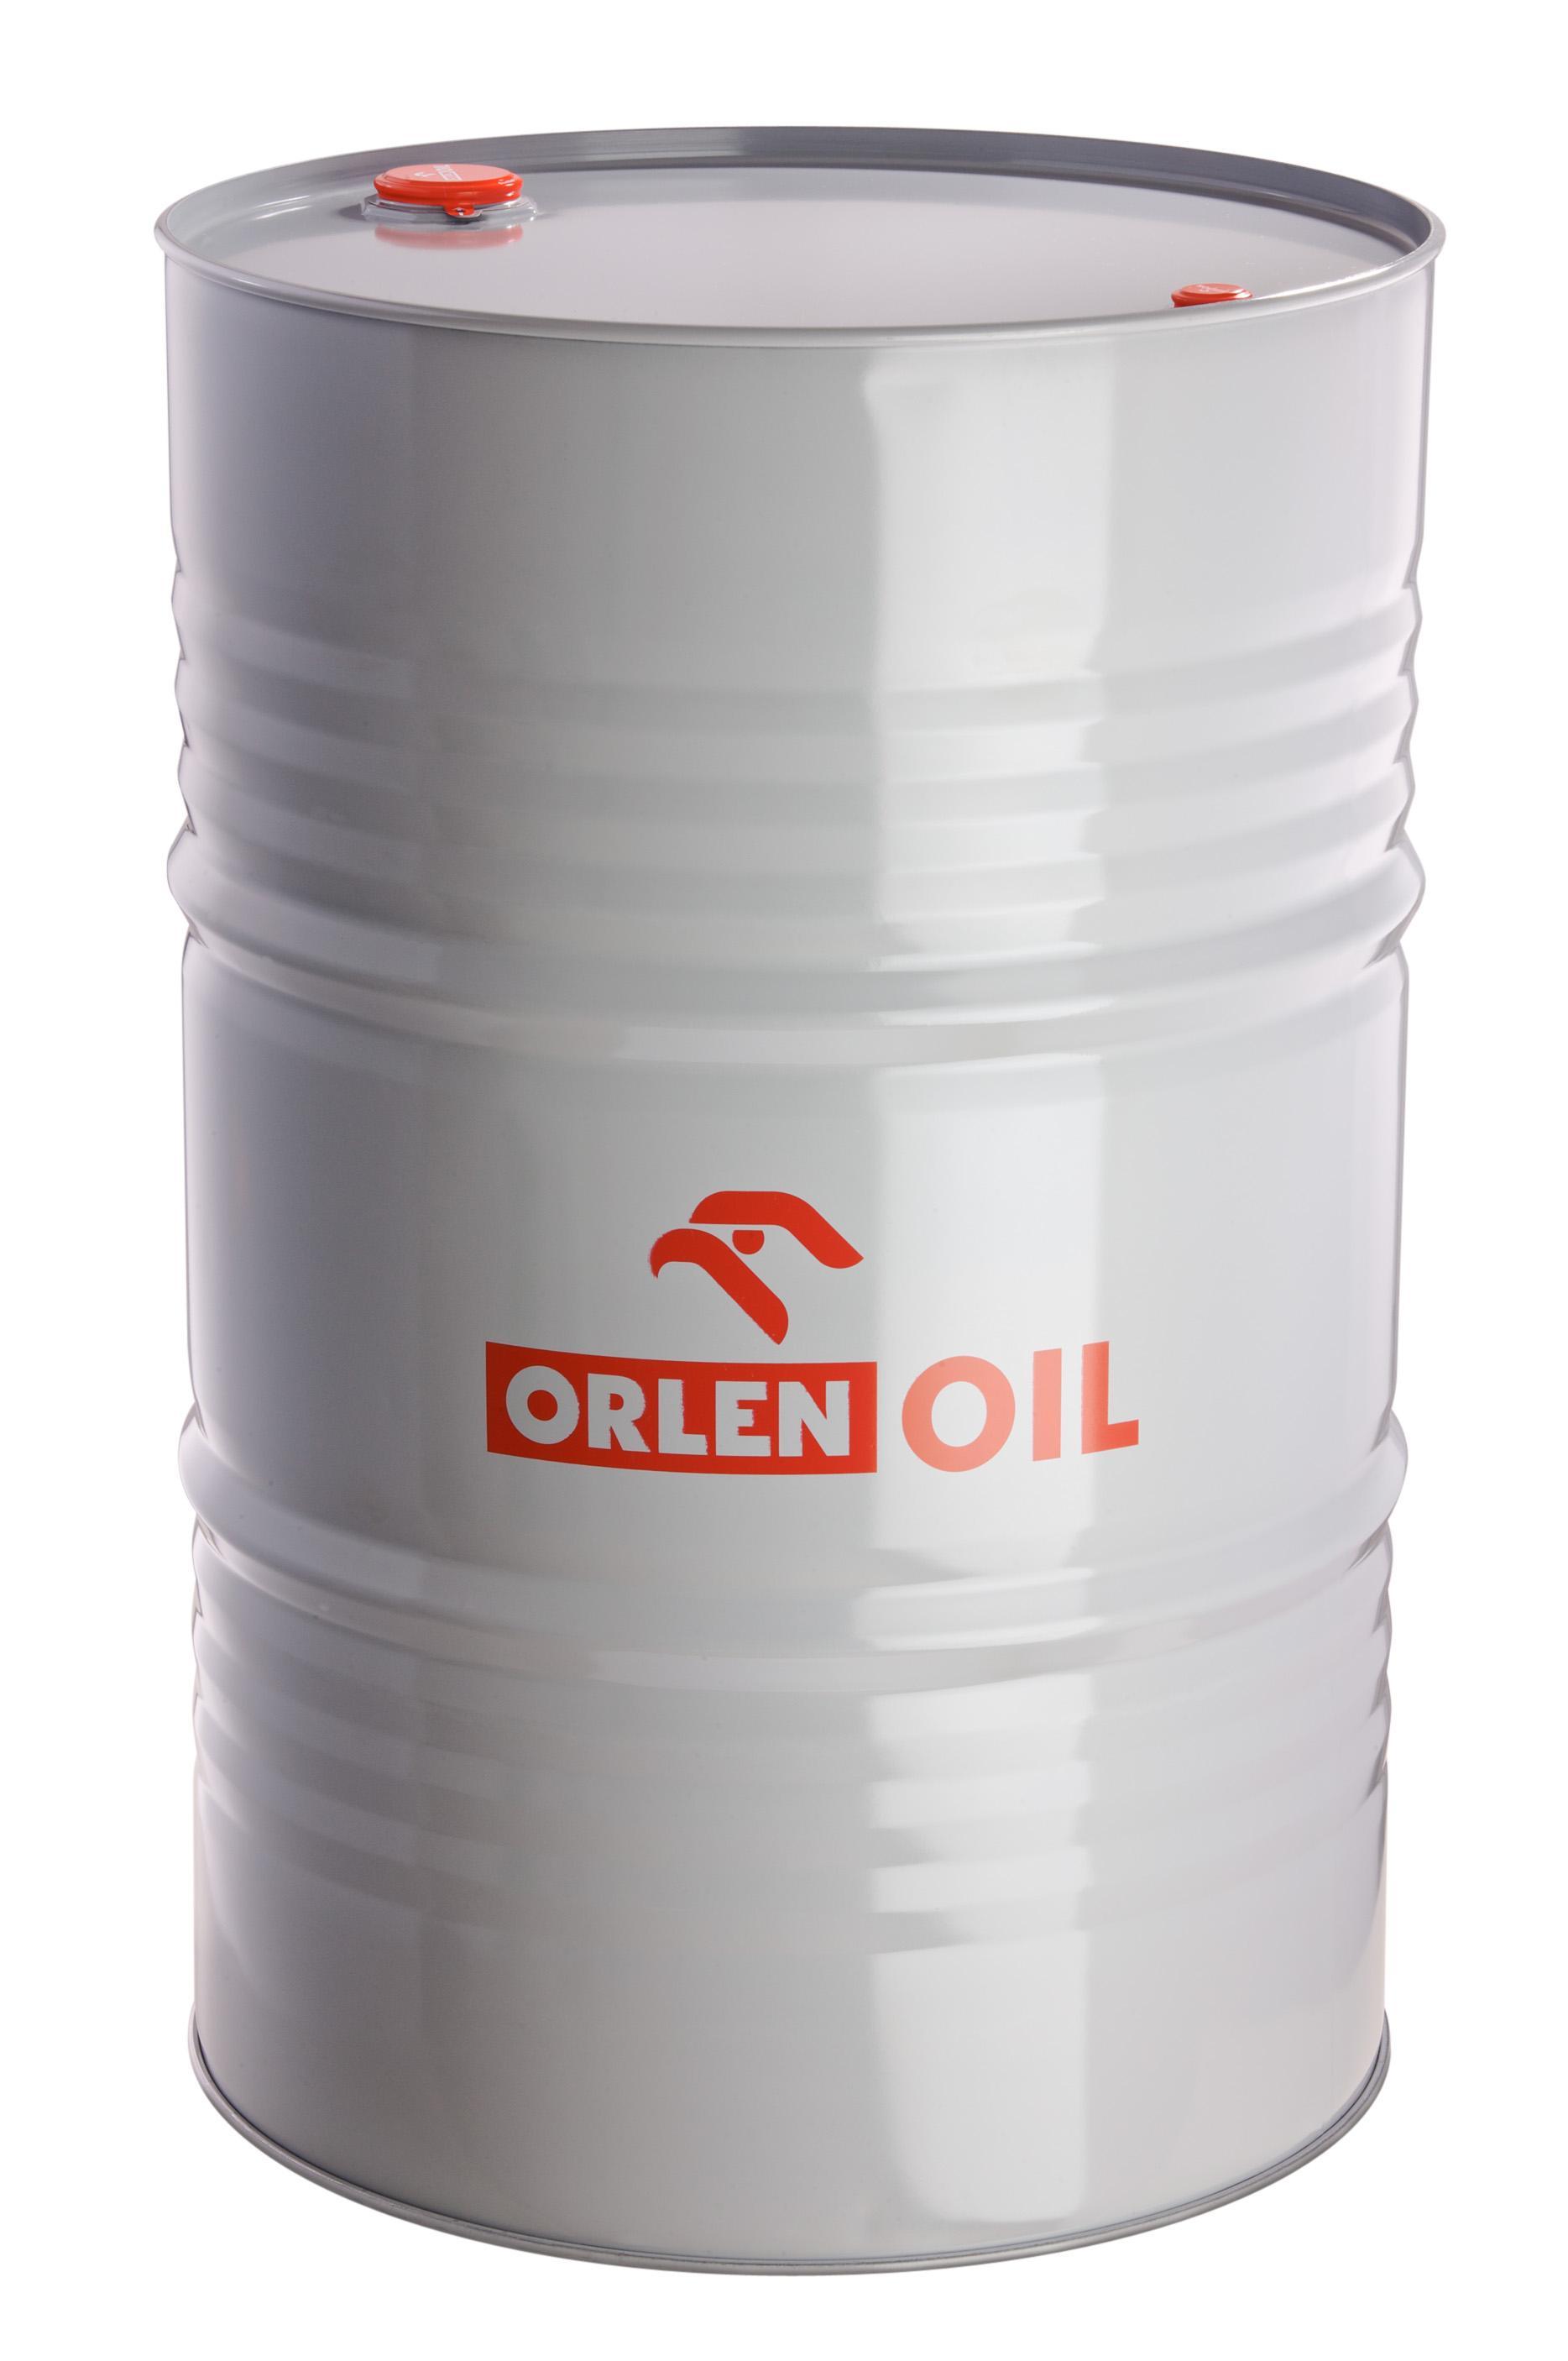 ORLEN OIL MIXOL S    BECZKA 205L